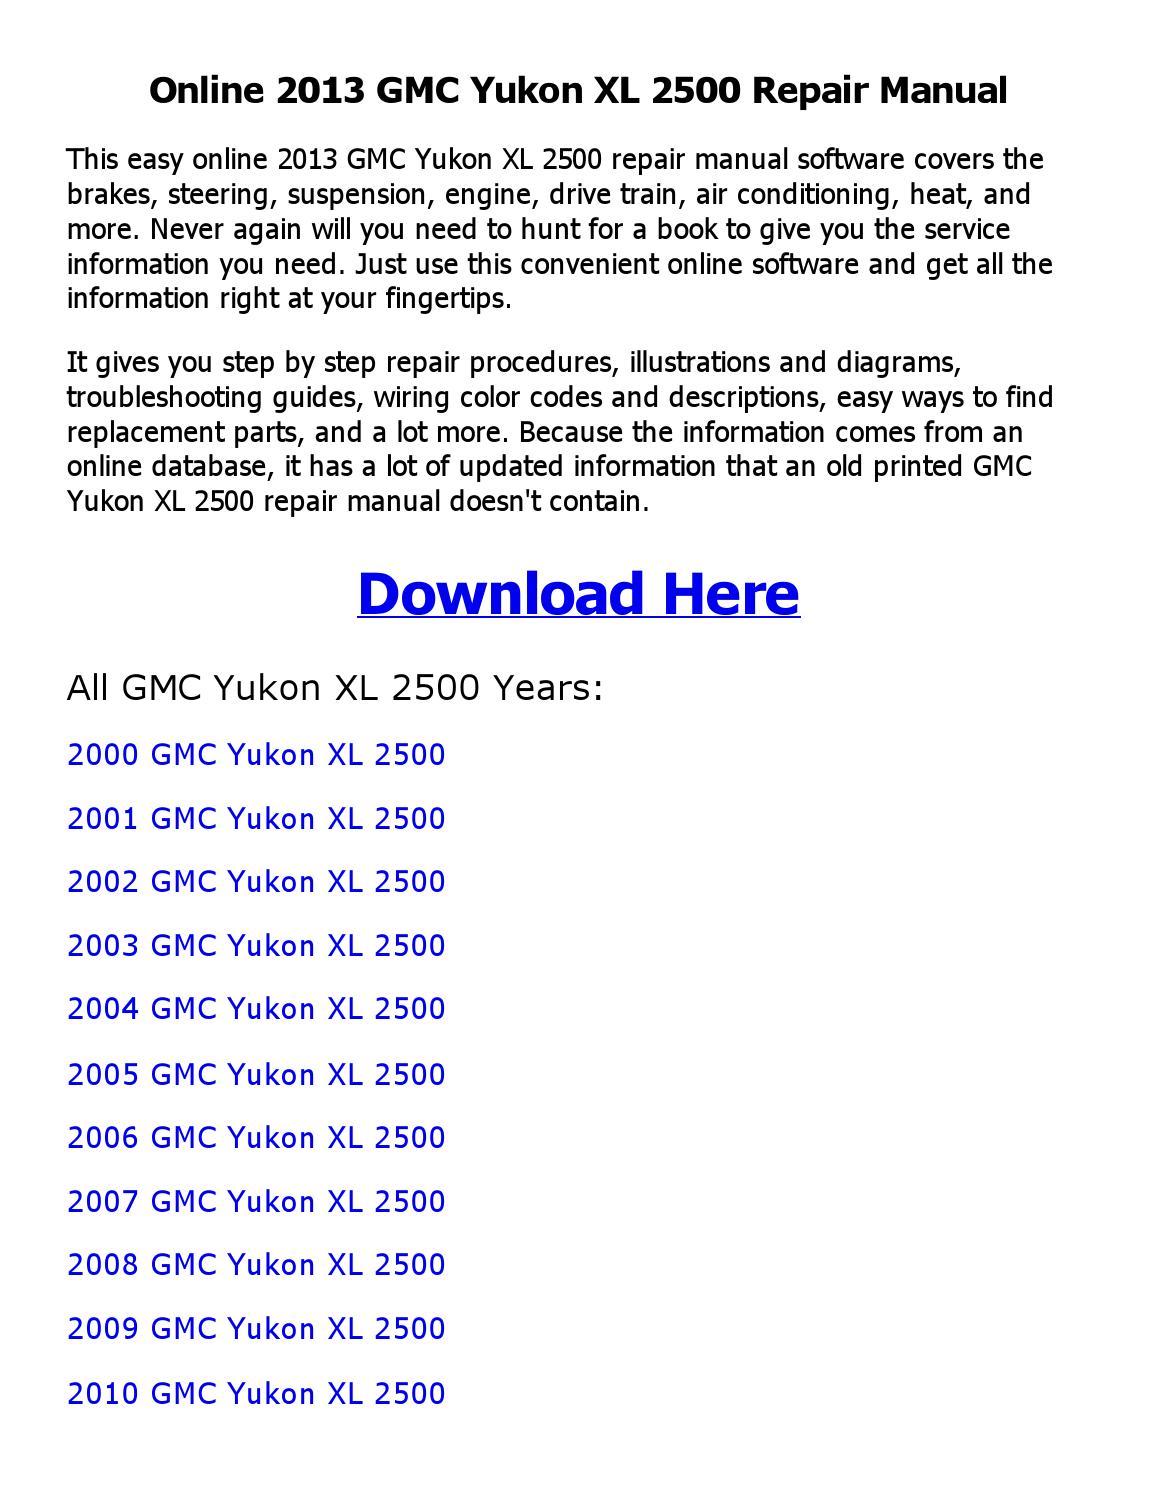 2013 Gmc Yukon Xl 2500 Repair Manual Online By Akosipriix Issuu 2009 Wiring